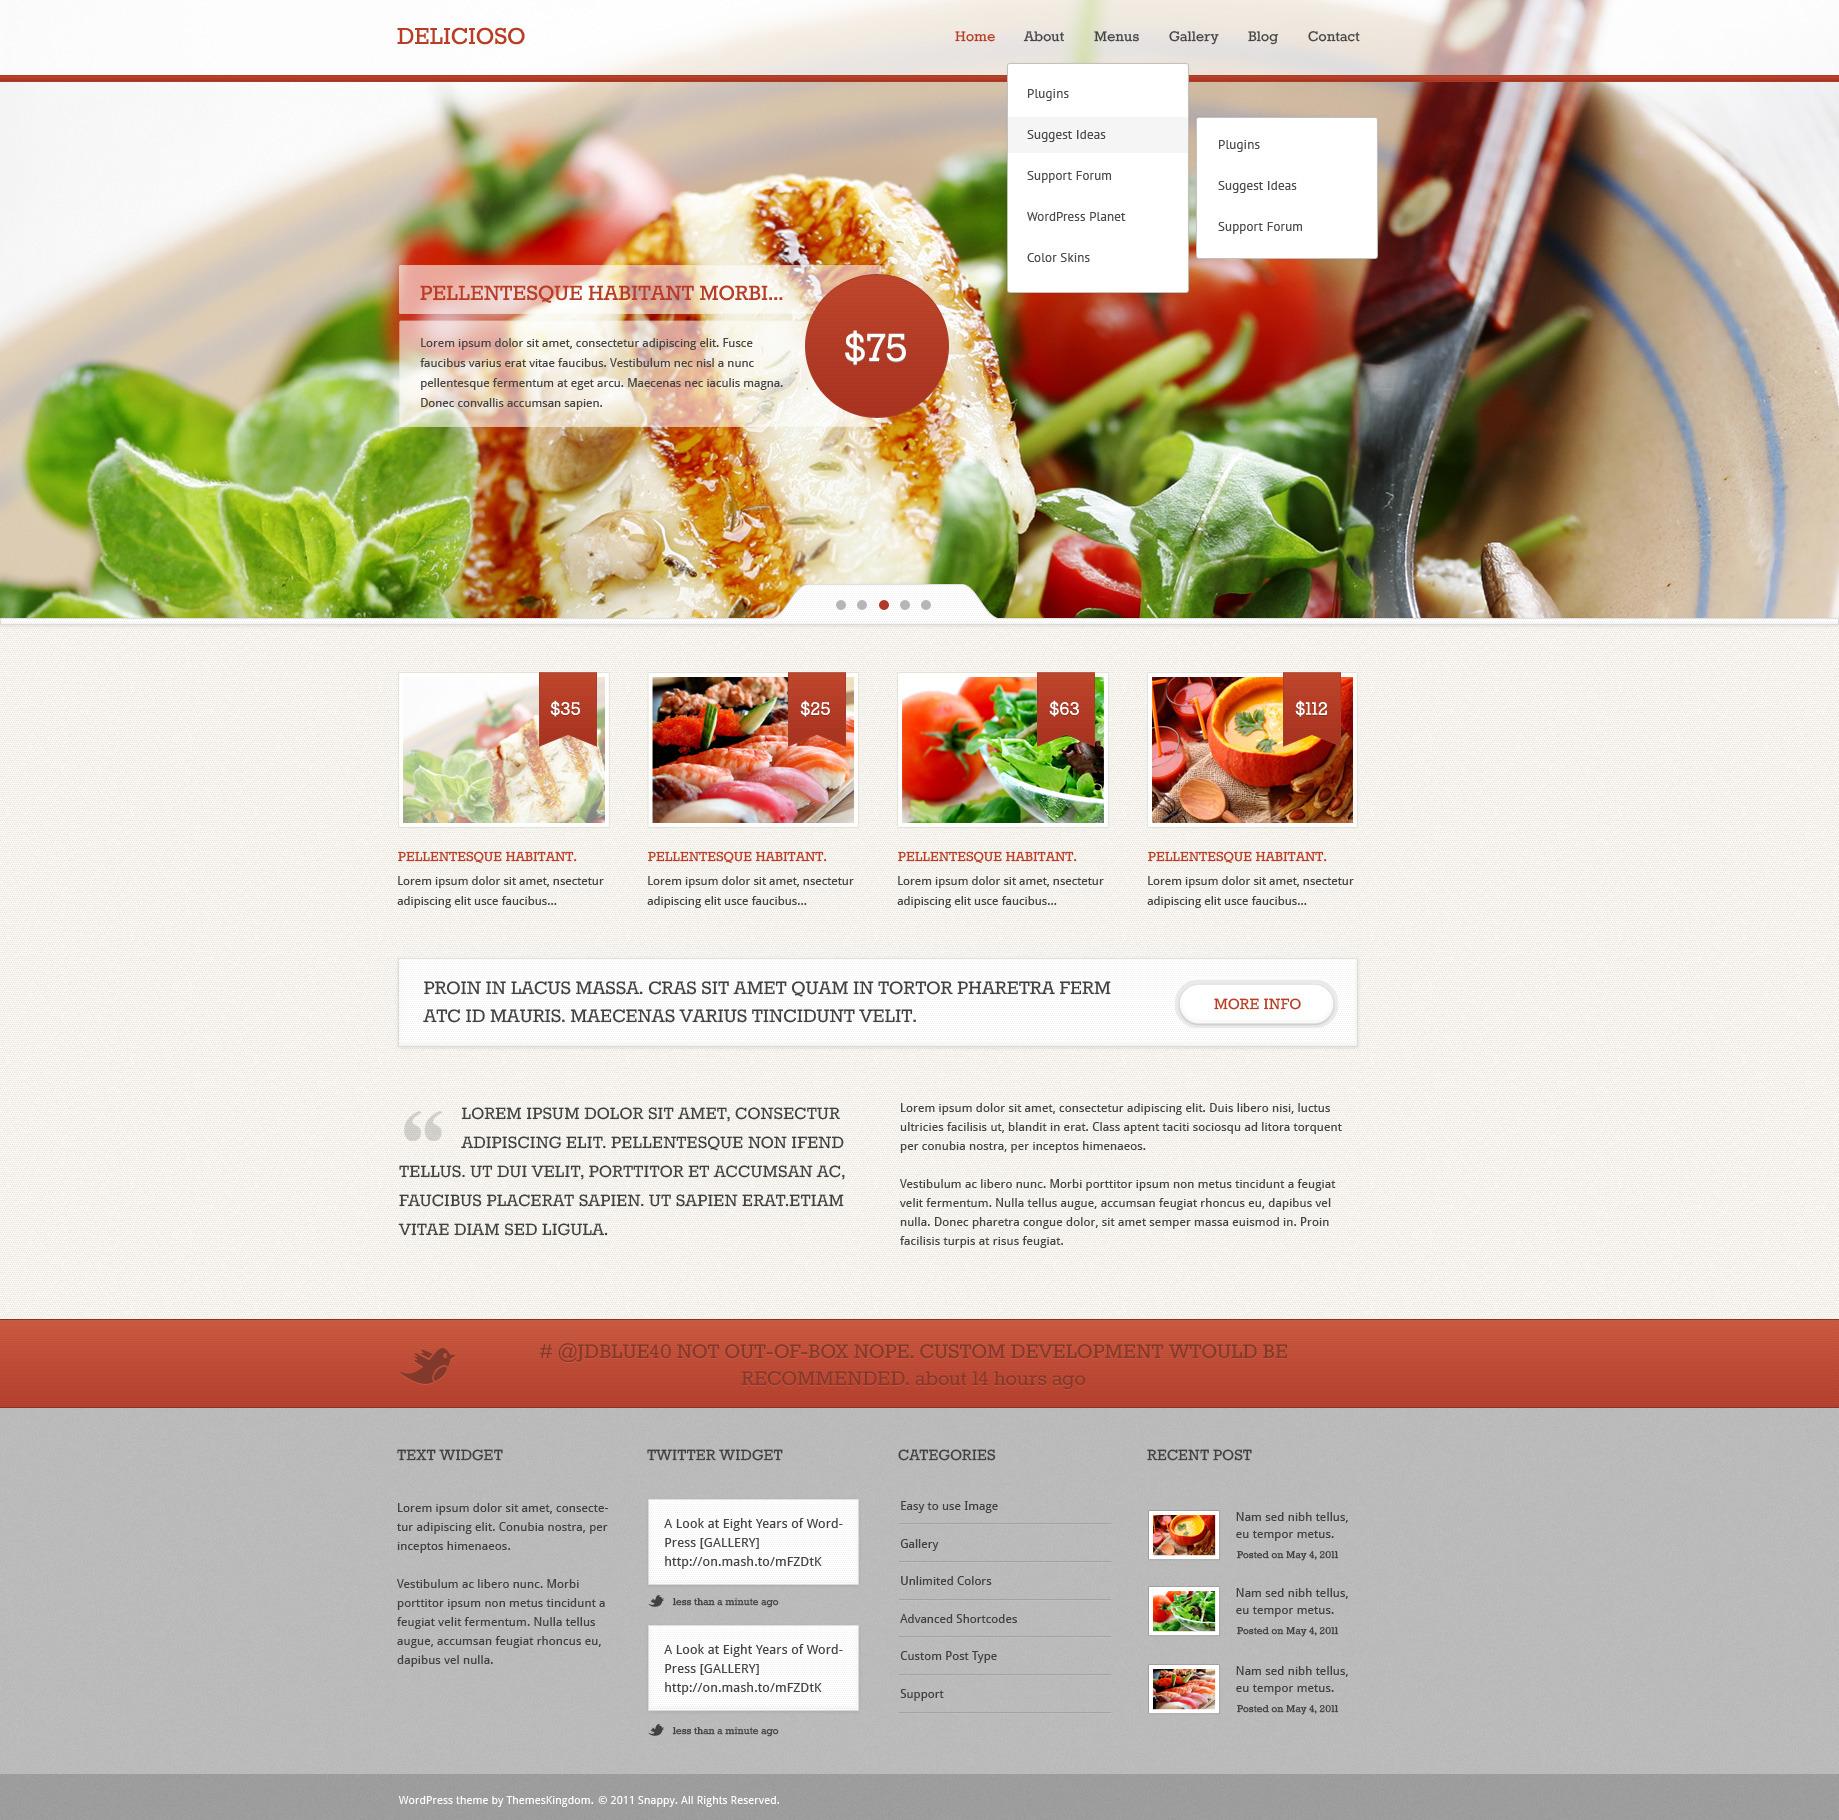 Delicioso - Delicious WordPress Restaurant Theme by cssmania ...